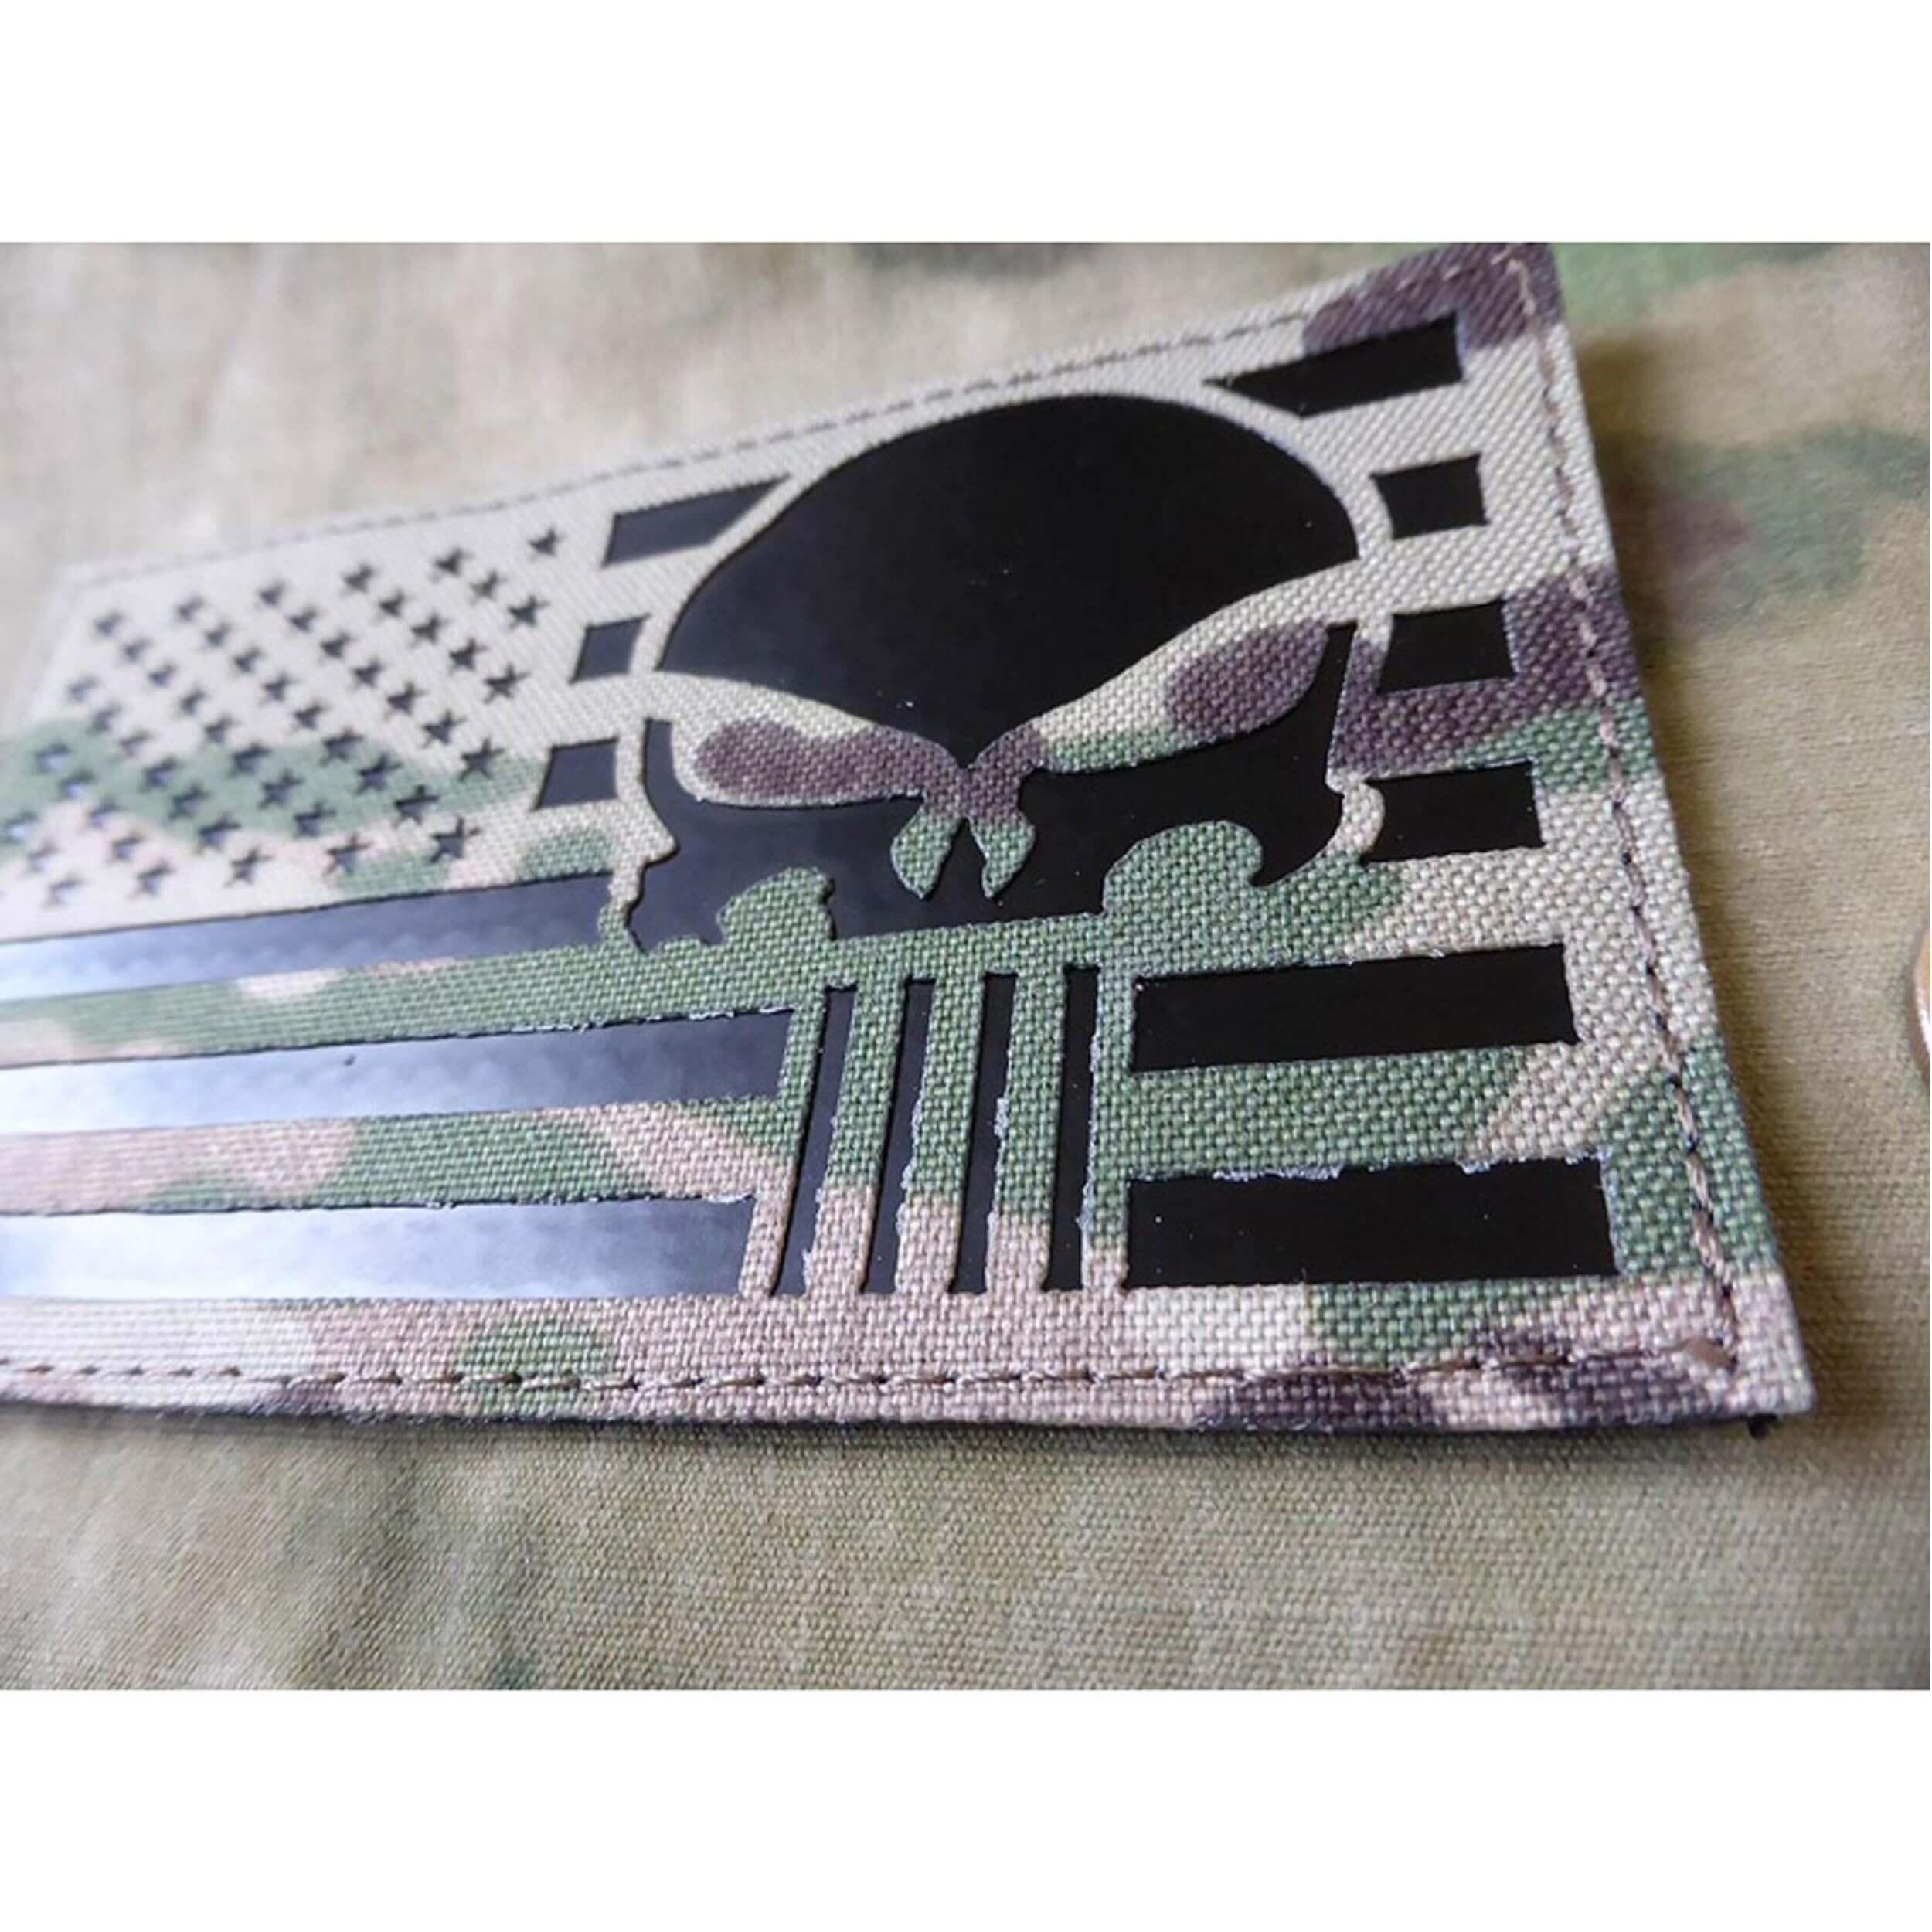 JTG Jumbo US Flag / Punisher - IR / Infrarot Patch - Lasercut, multicam, mit Klettrückseite